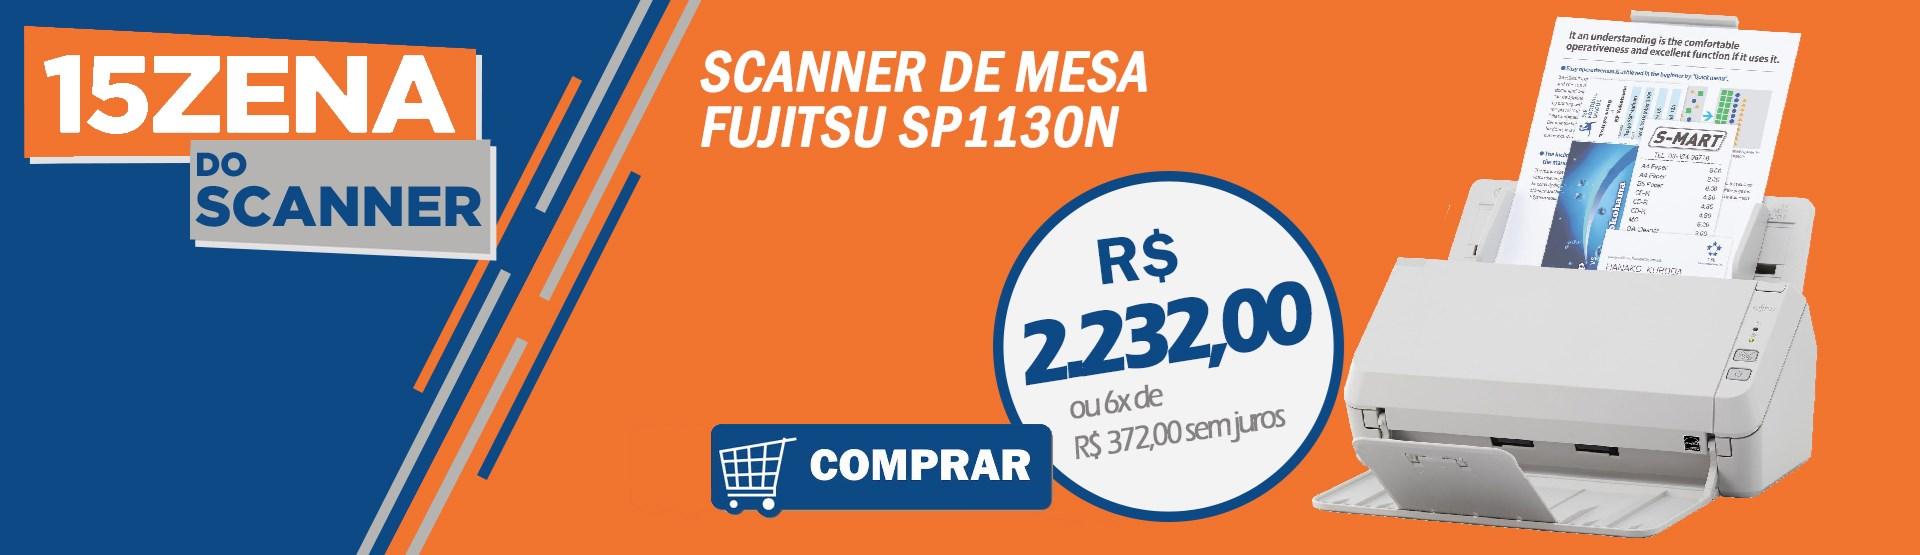 15zena do Scanner SP1130N